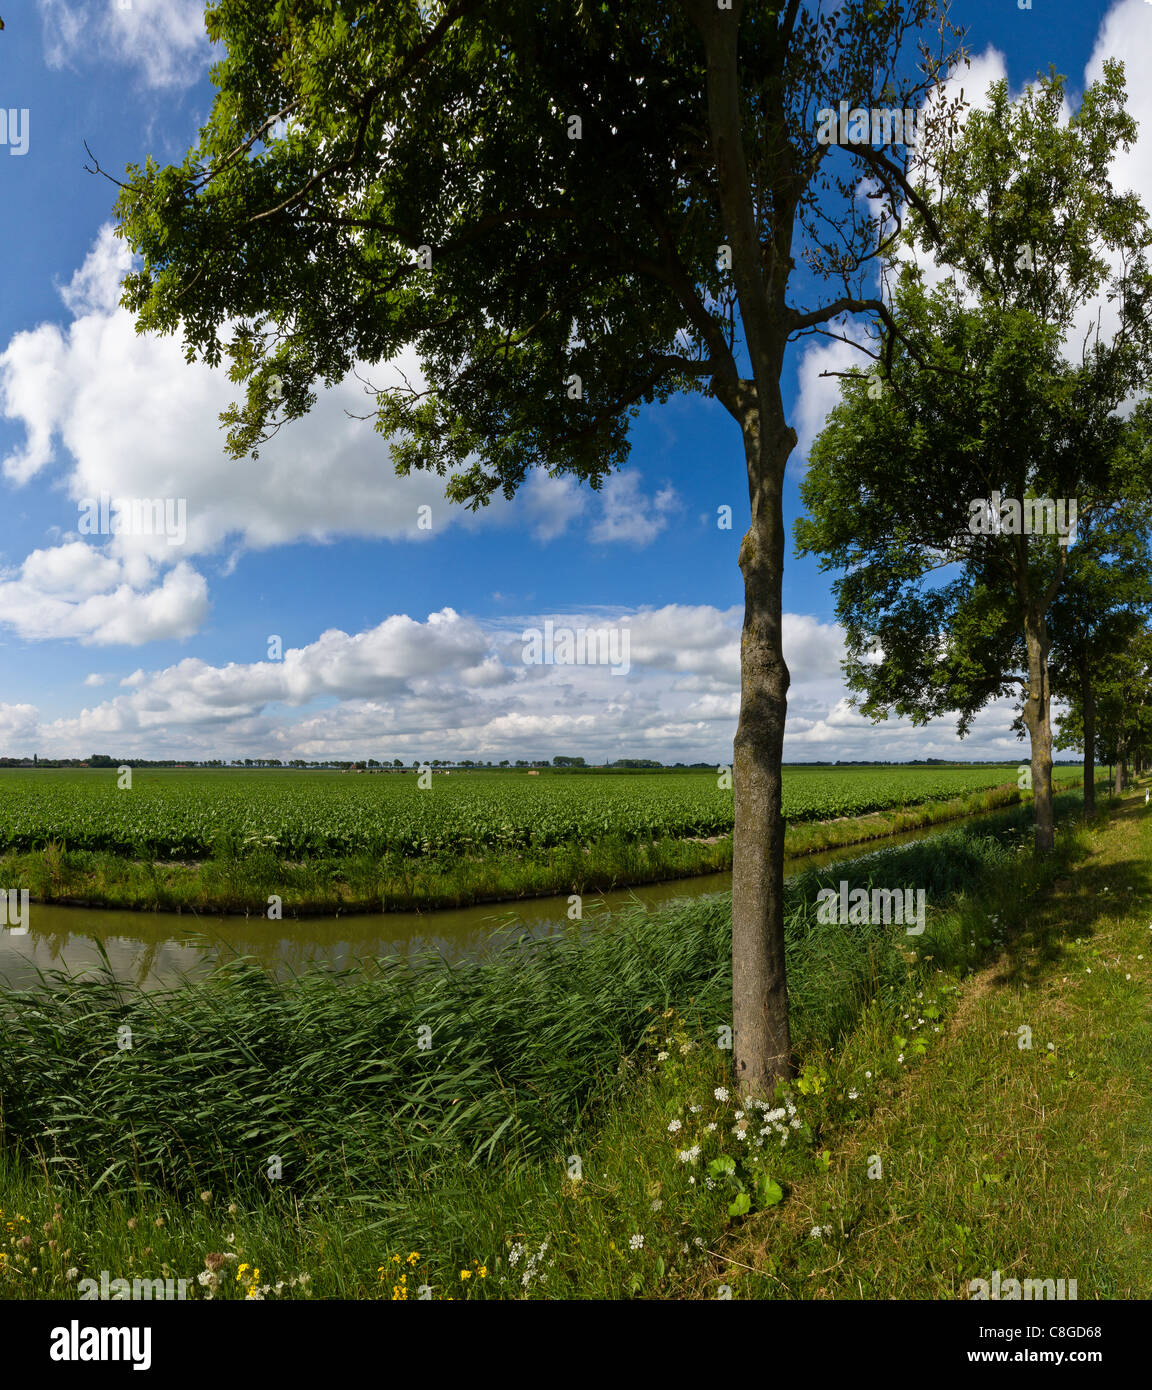 Netherlands, Europe, Holland, Noordbeemster, Polder, De Beemster, landscape, field, meadow, trees, summer, - Stock Image